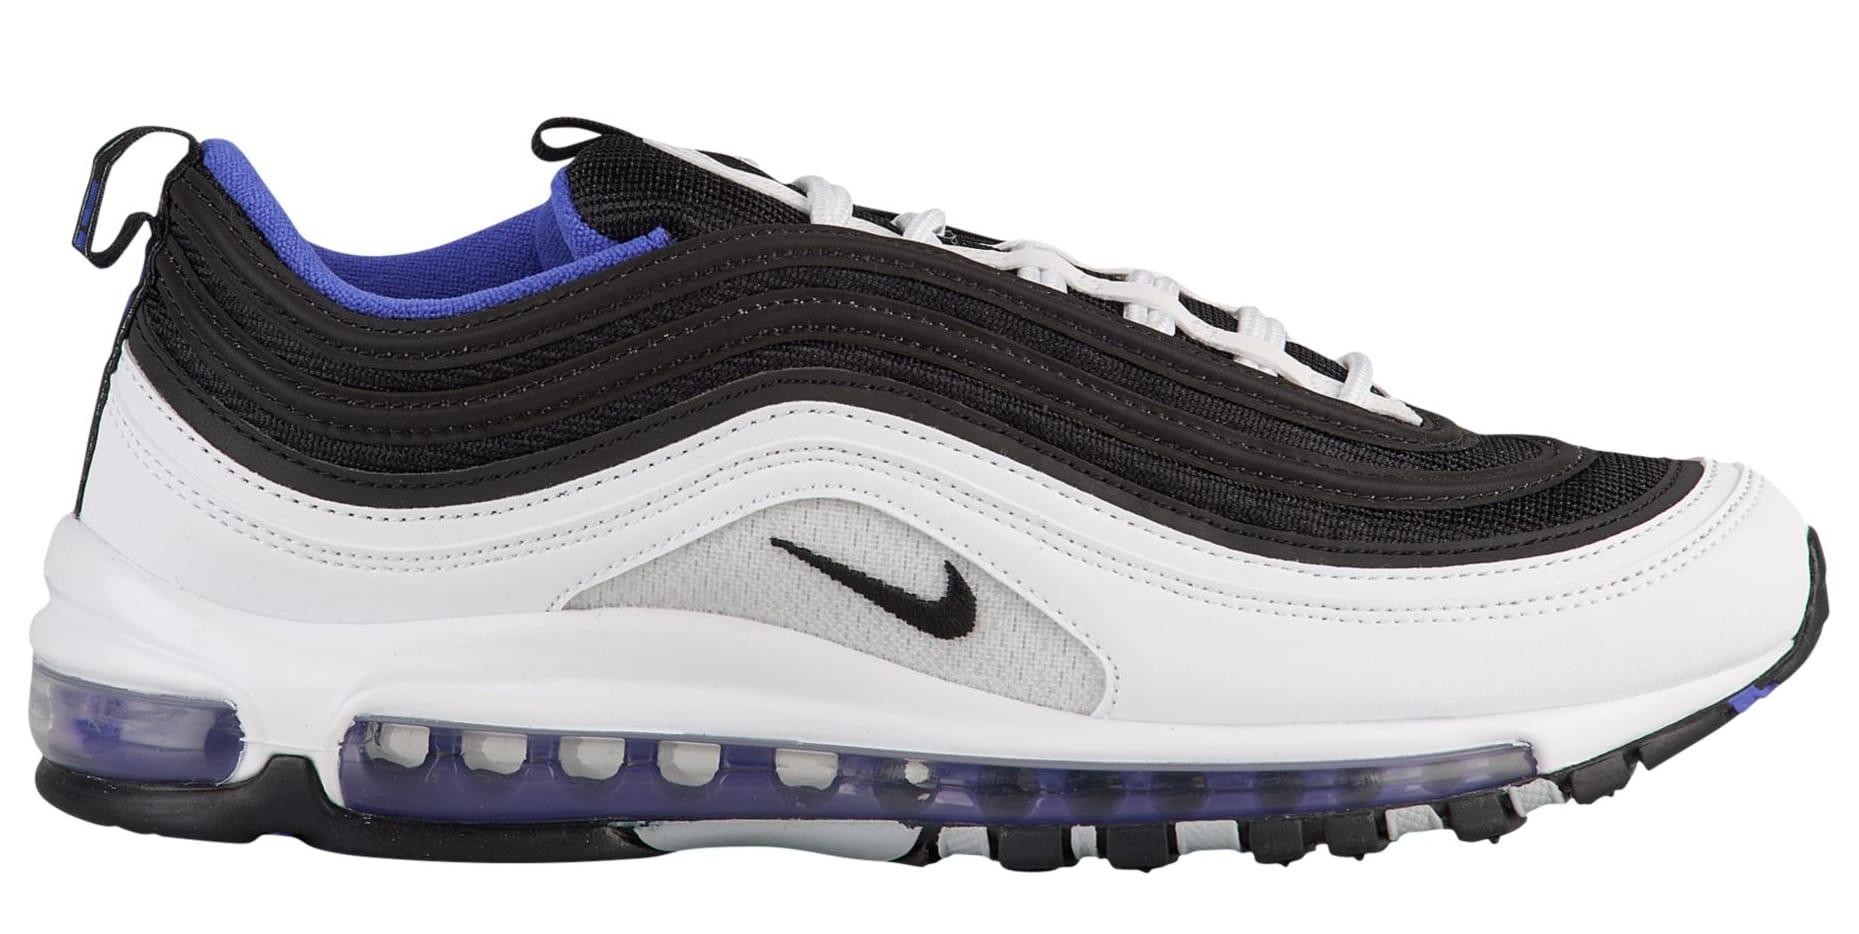 Nike SportswearAIR MAX 97 - Trainers - white/black/persian violet MfVFqycWk